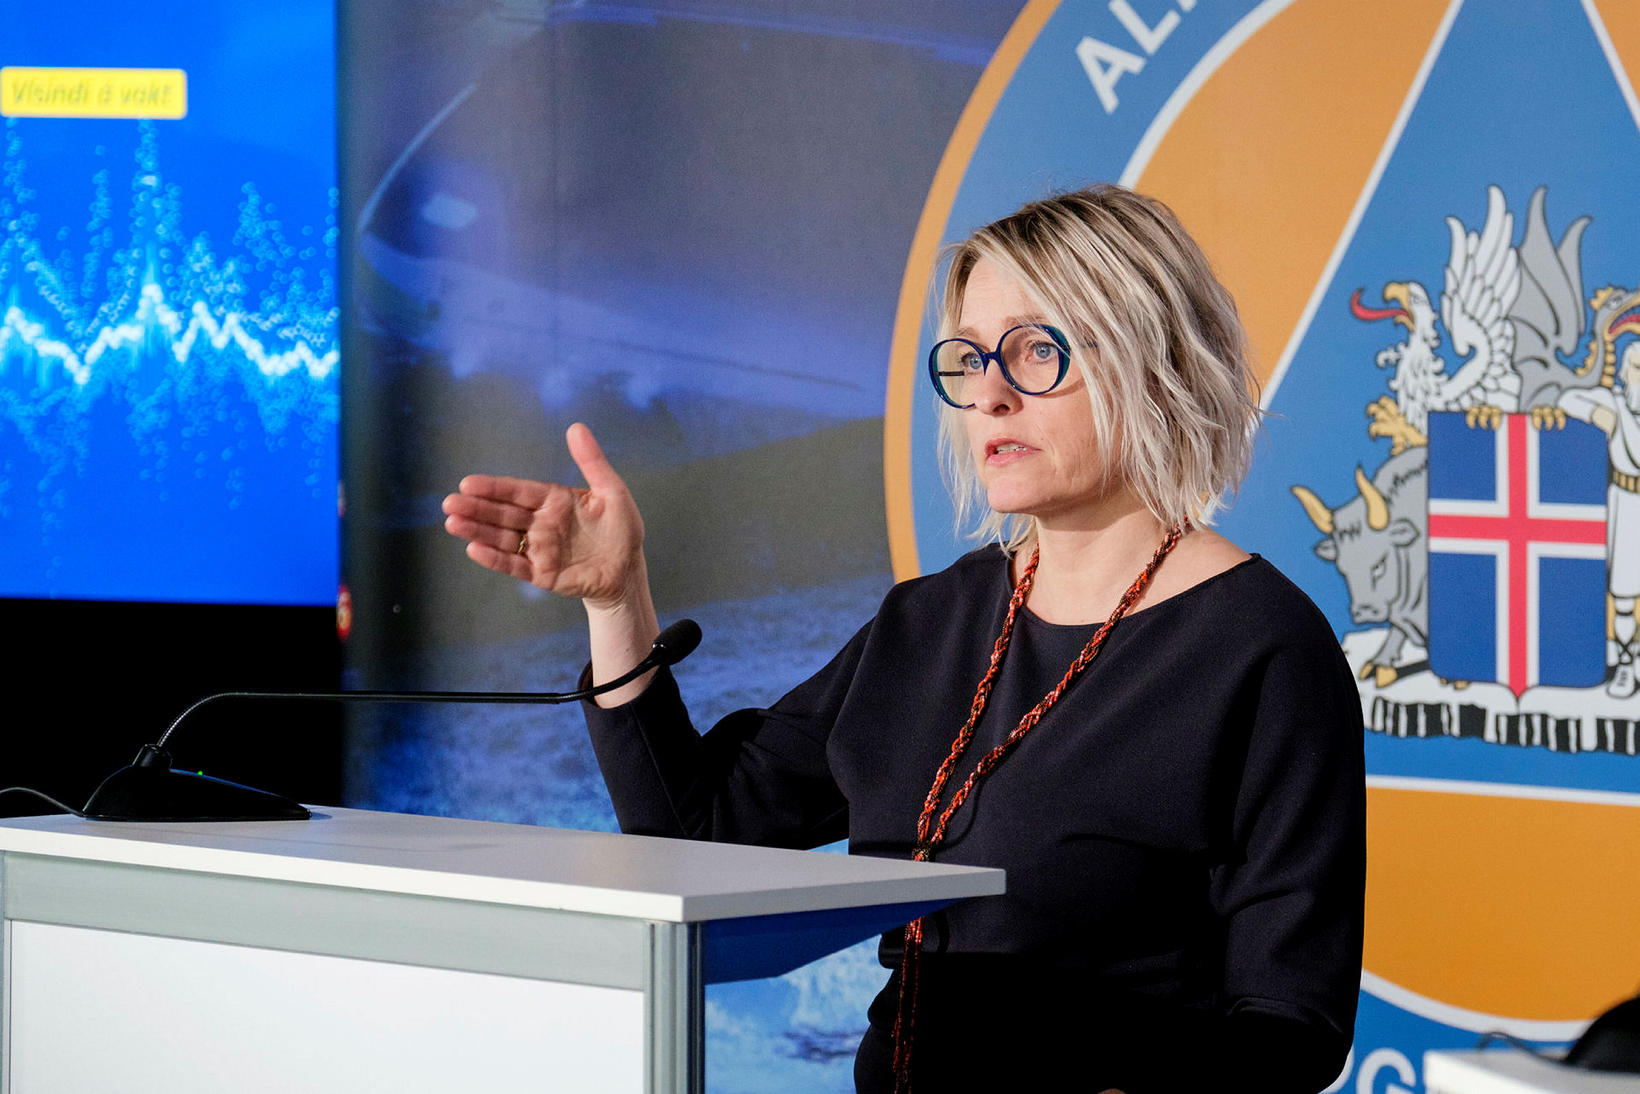 Kristín Jónsdóttir, natural hazards specialist at the Icelandic Met Office.